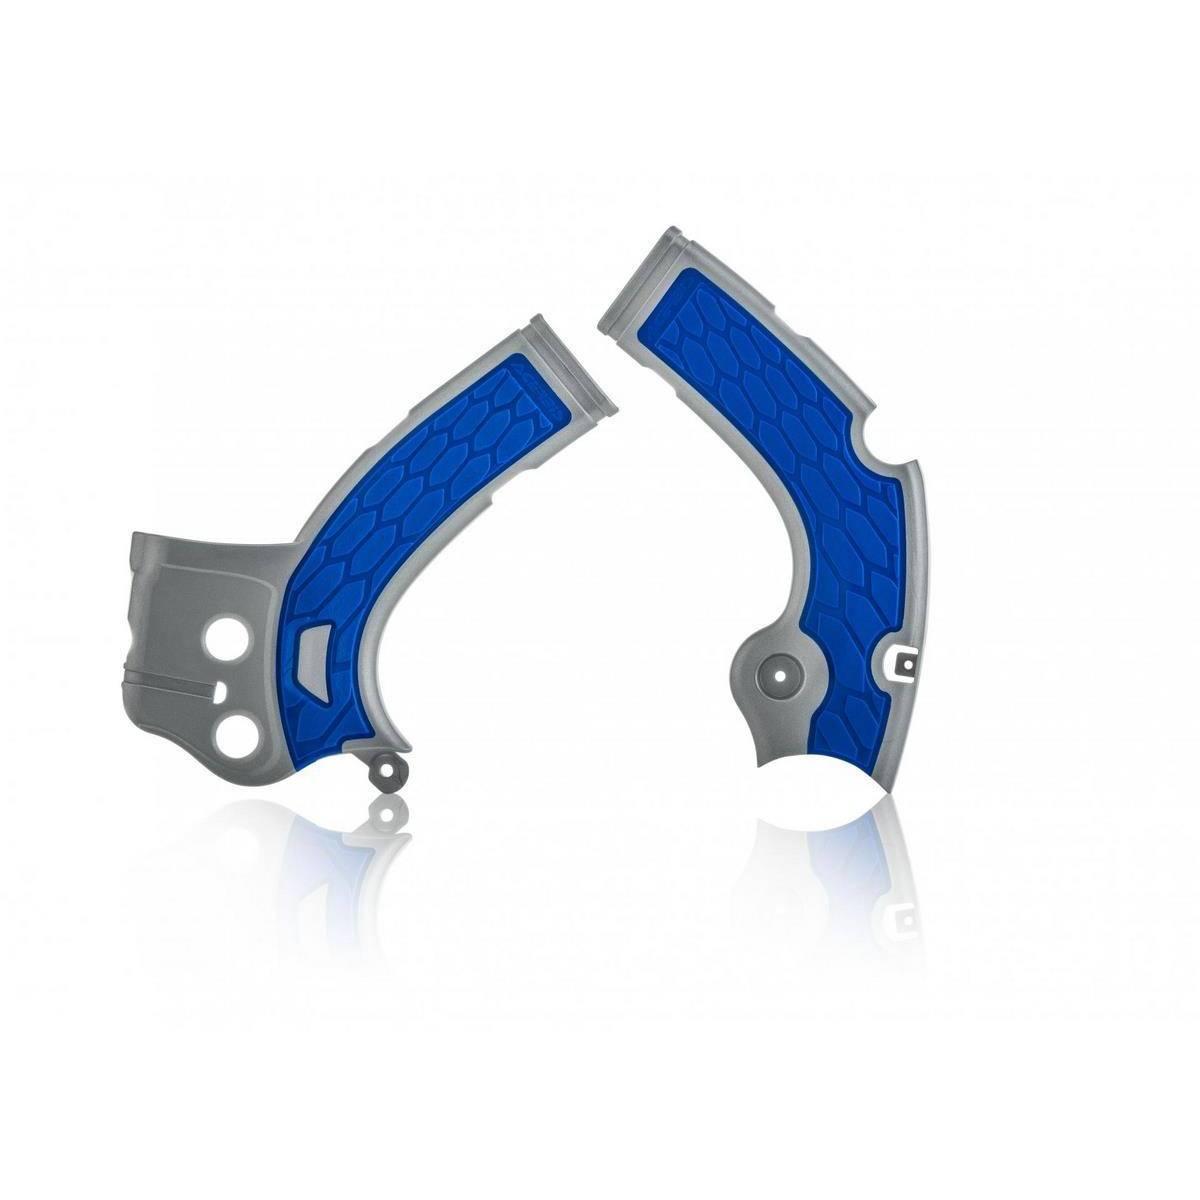 0022444-218 - Cubre Chasis Acerbis Yzf 250 17 18 Plata Azul